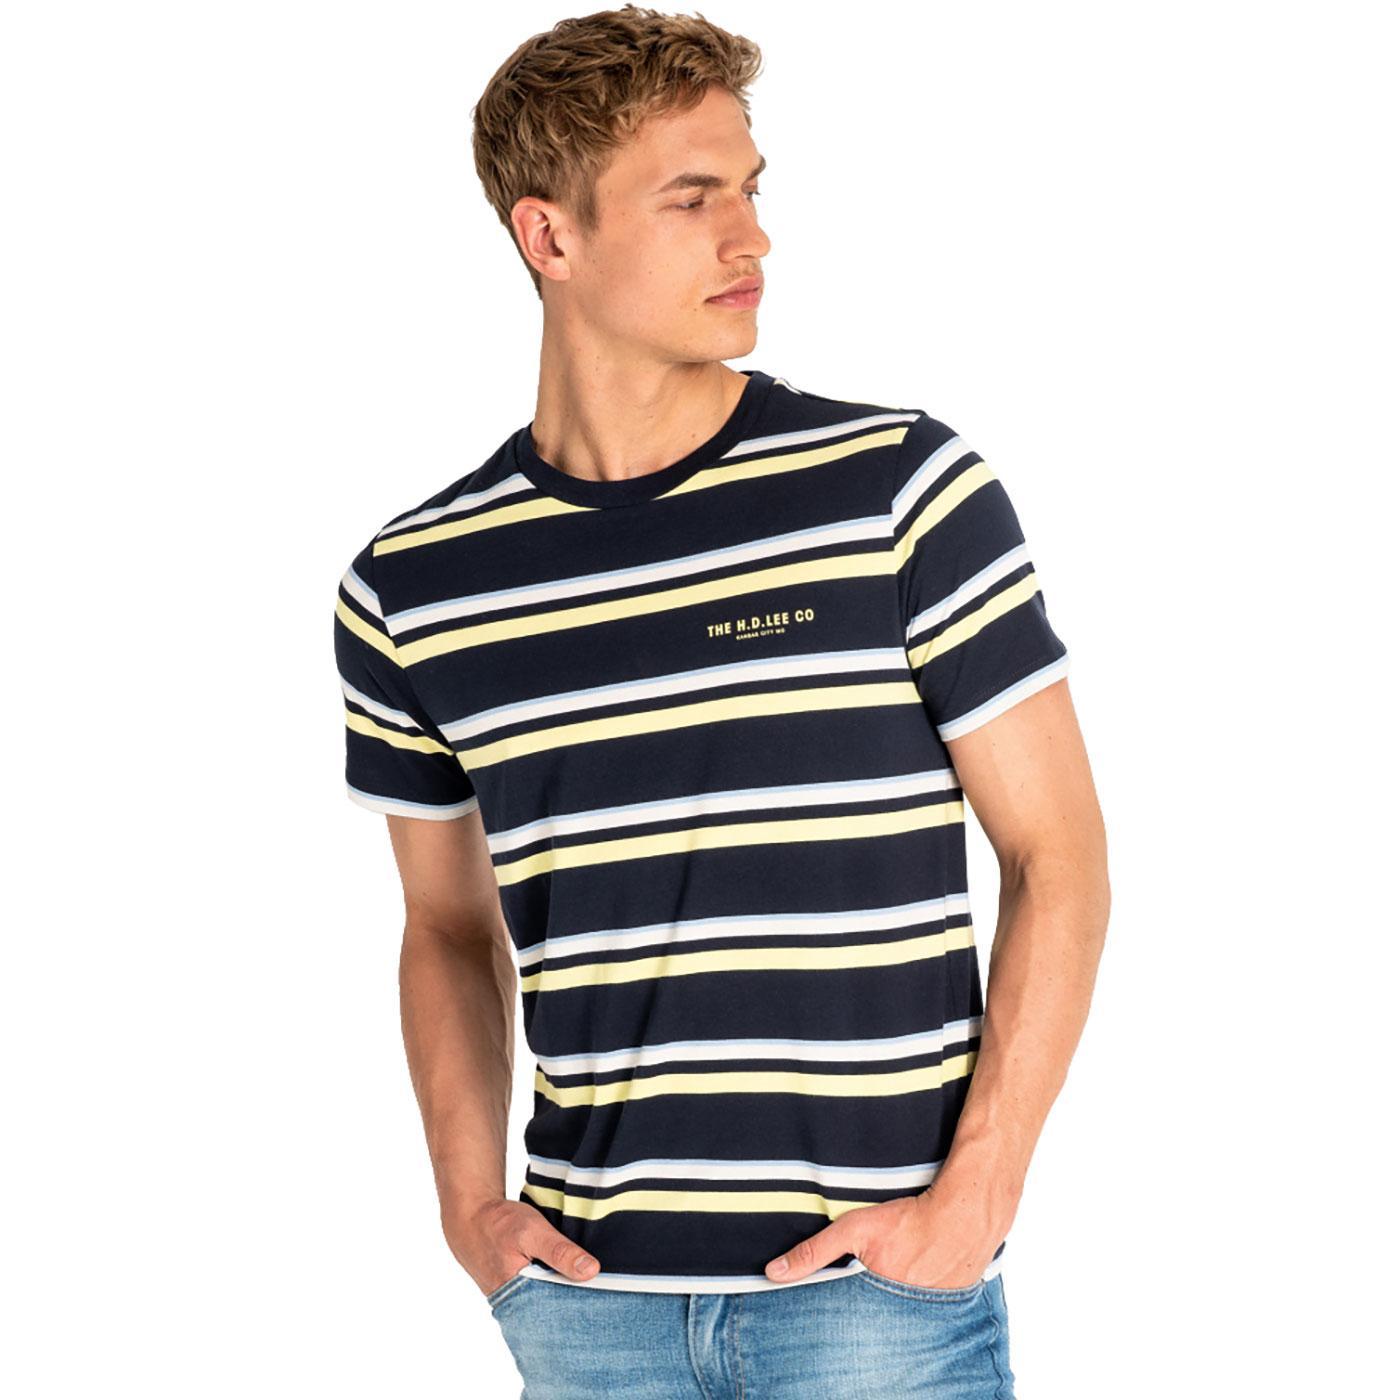 LEE JEANS Retro Multi Stripe T-Shirt SKY CAPTAIN